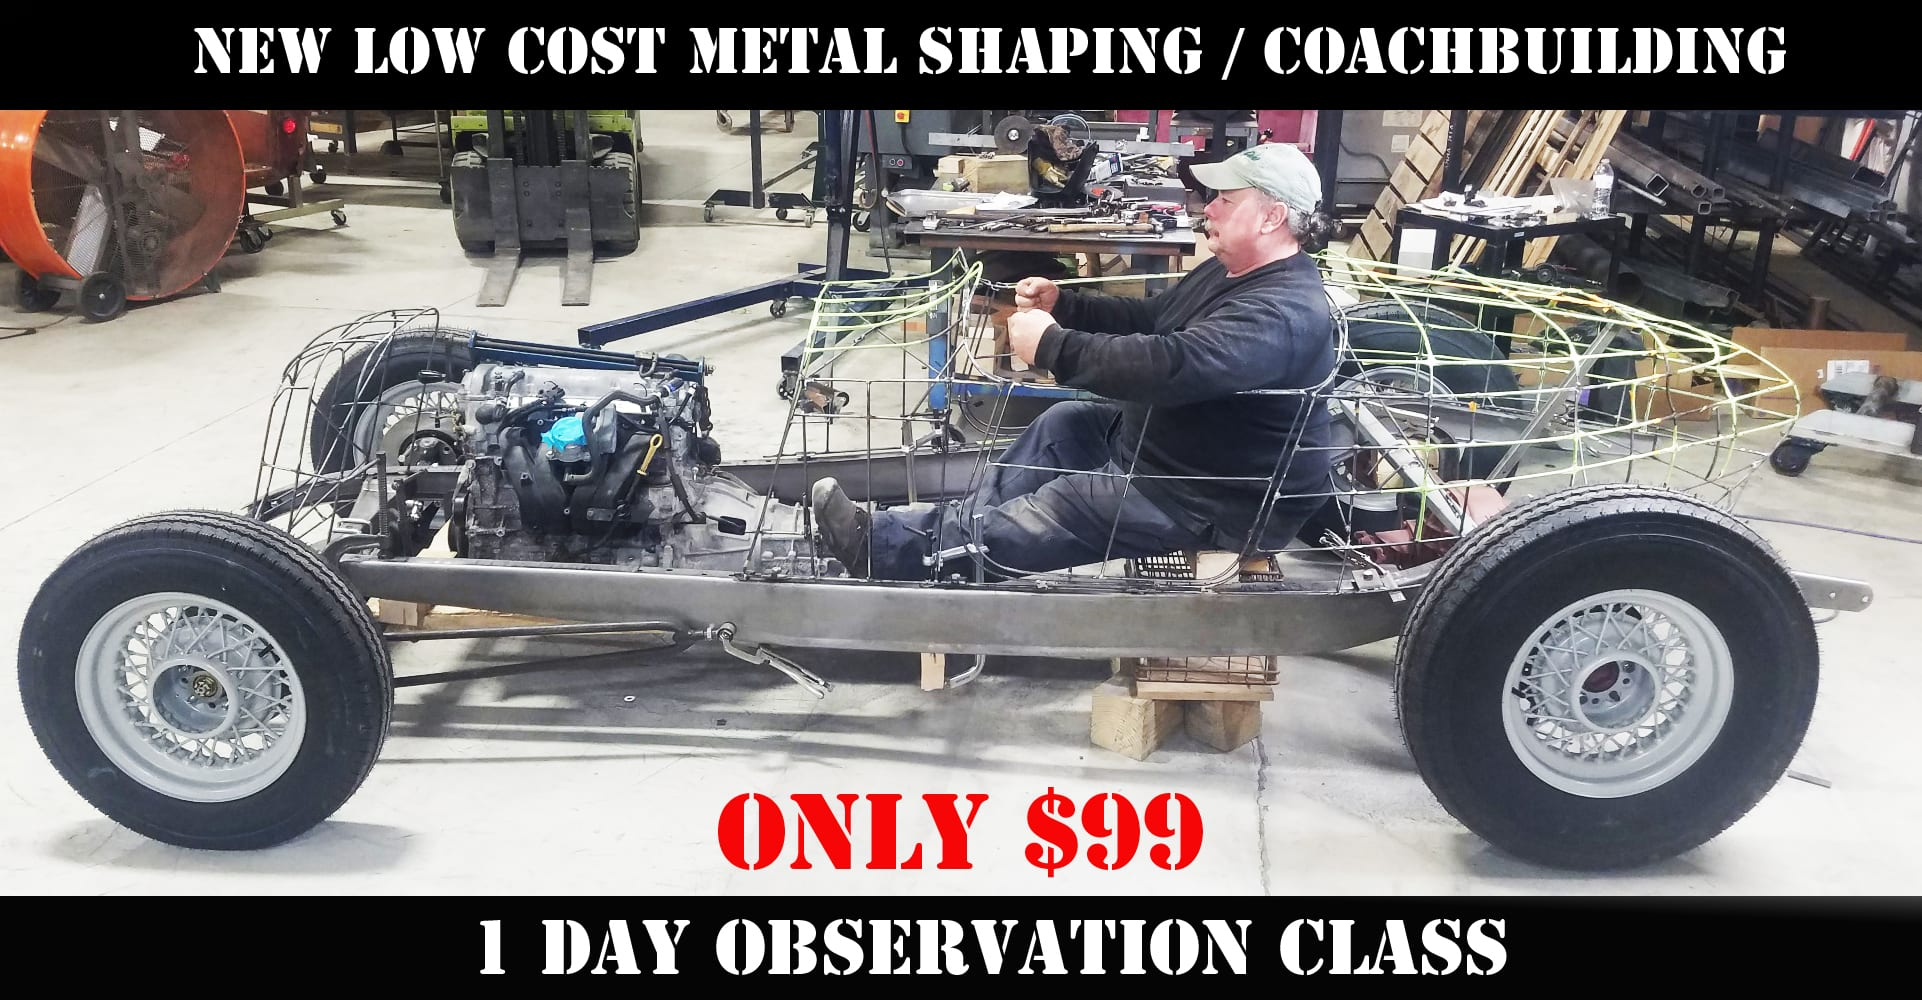 Metalshaping class